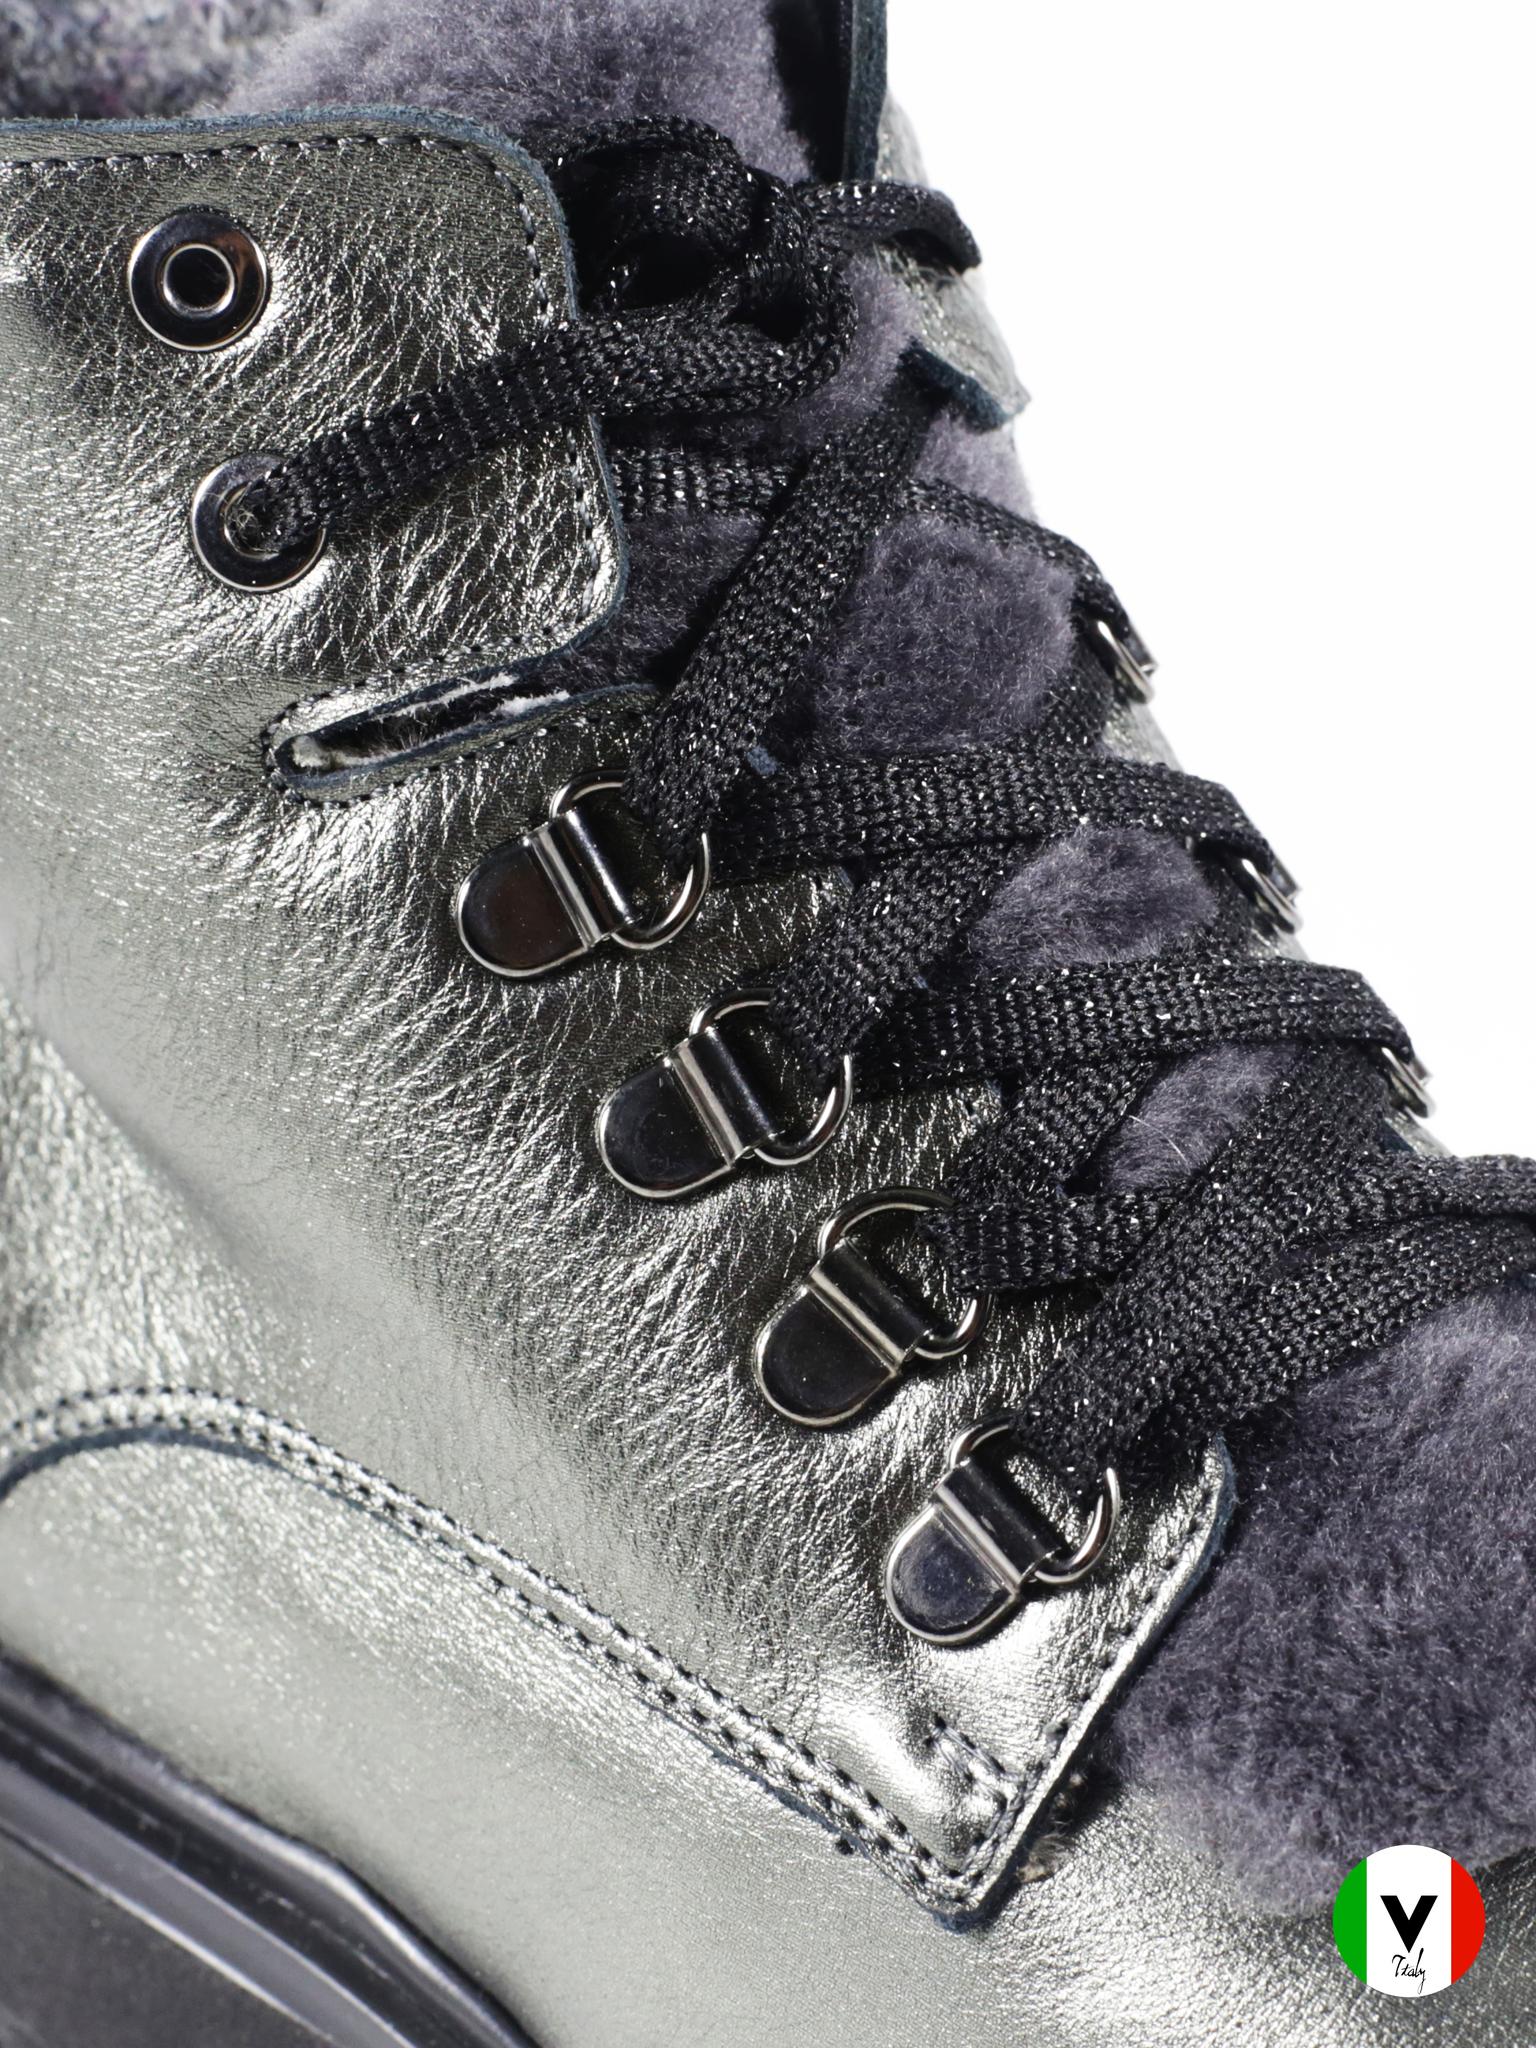 Зимние ботинки Giada Gabrielli из кожи 844, артикул 844, сезон зима, цвет серый, материал кожа, цена 11 000 руб., veroitaly.ru